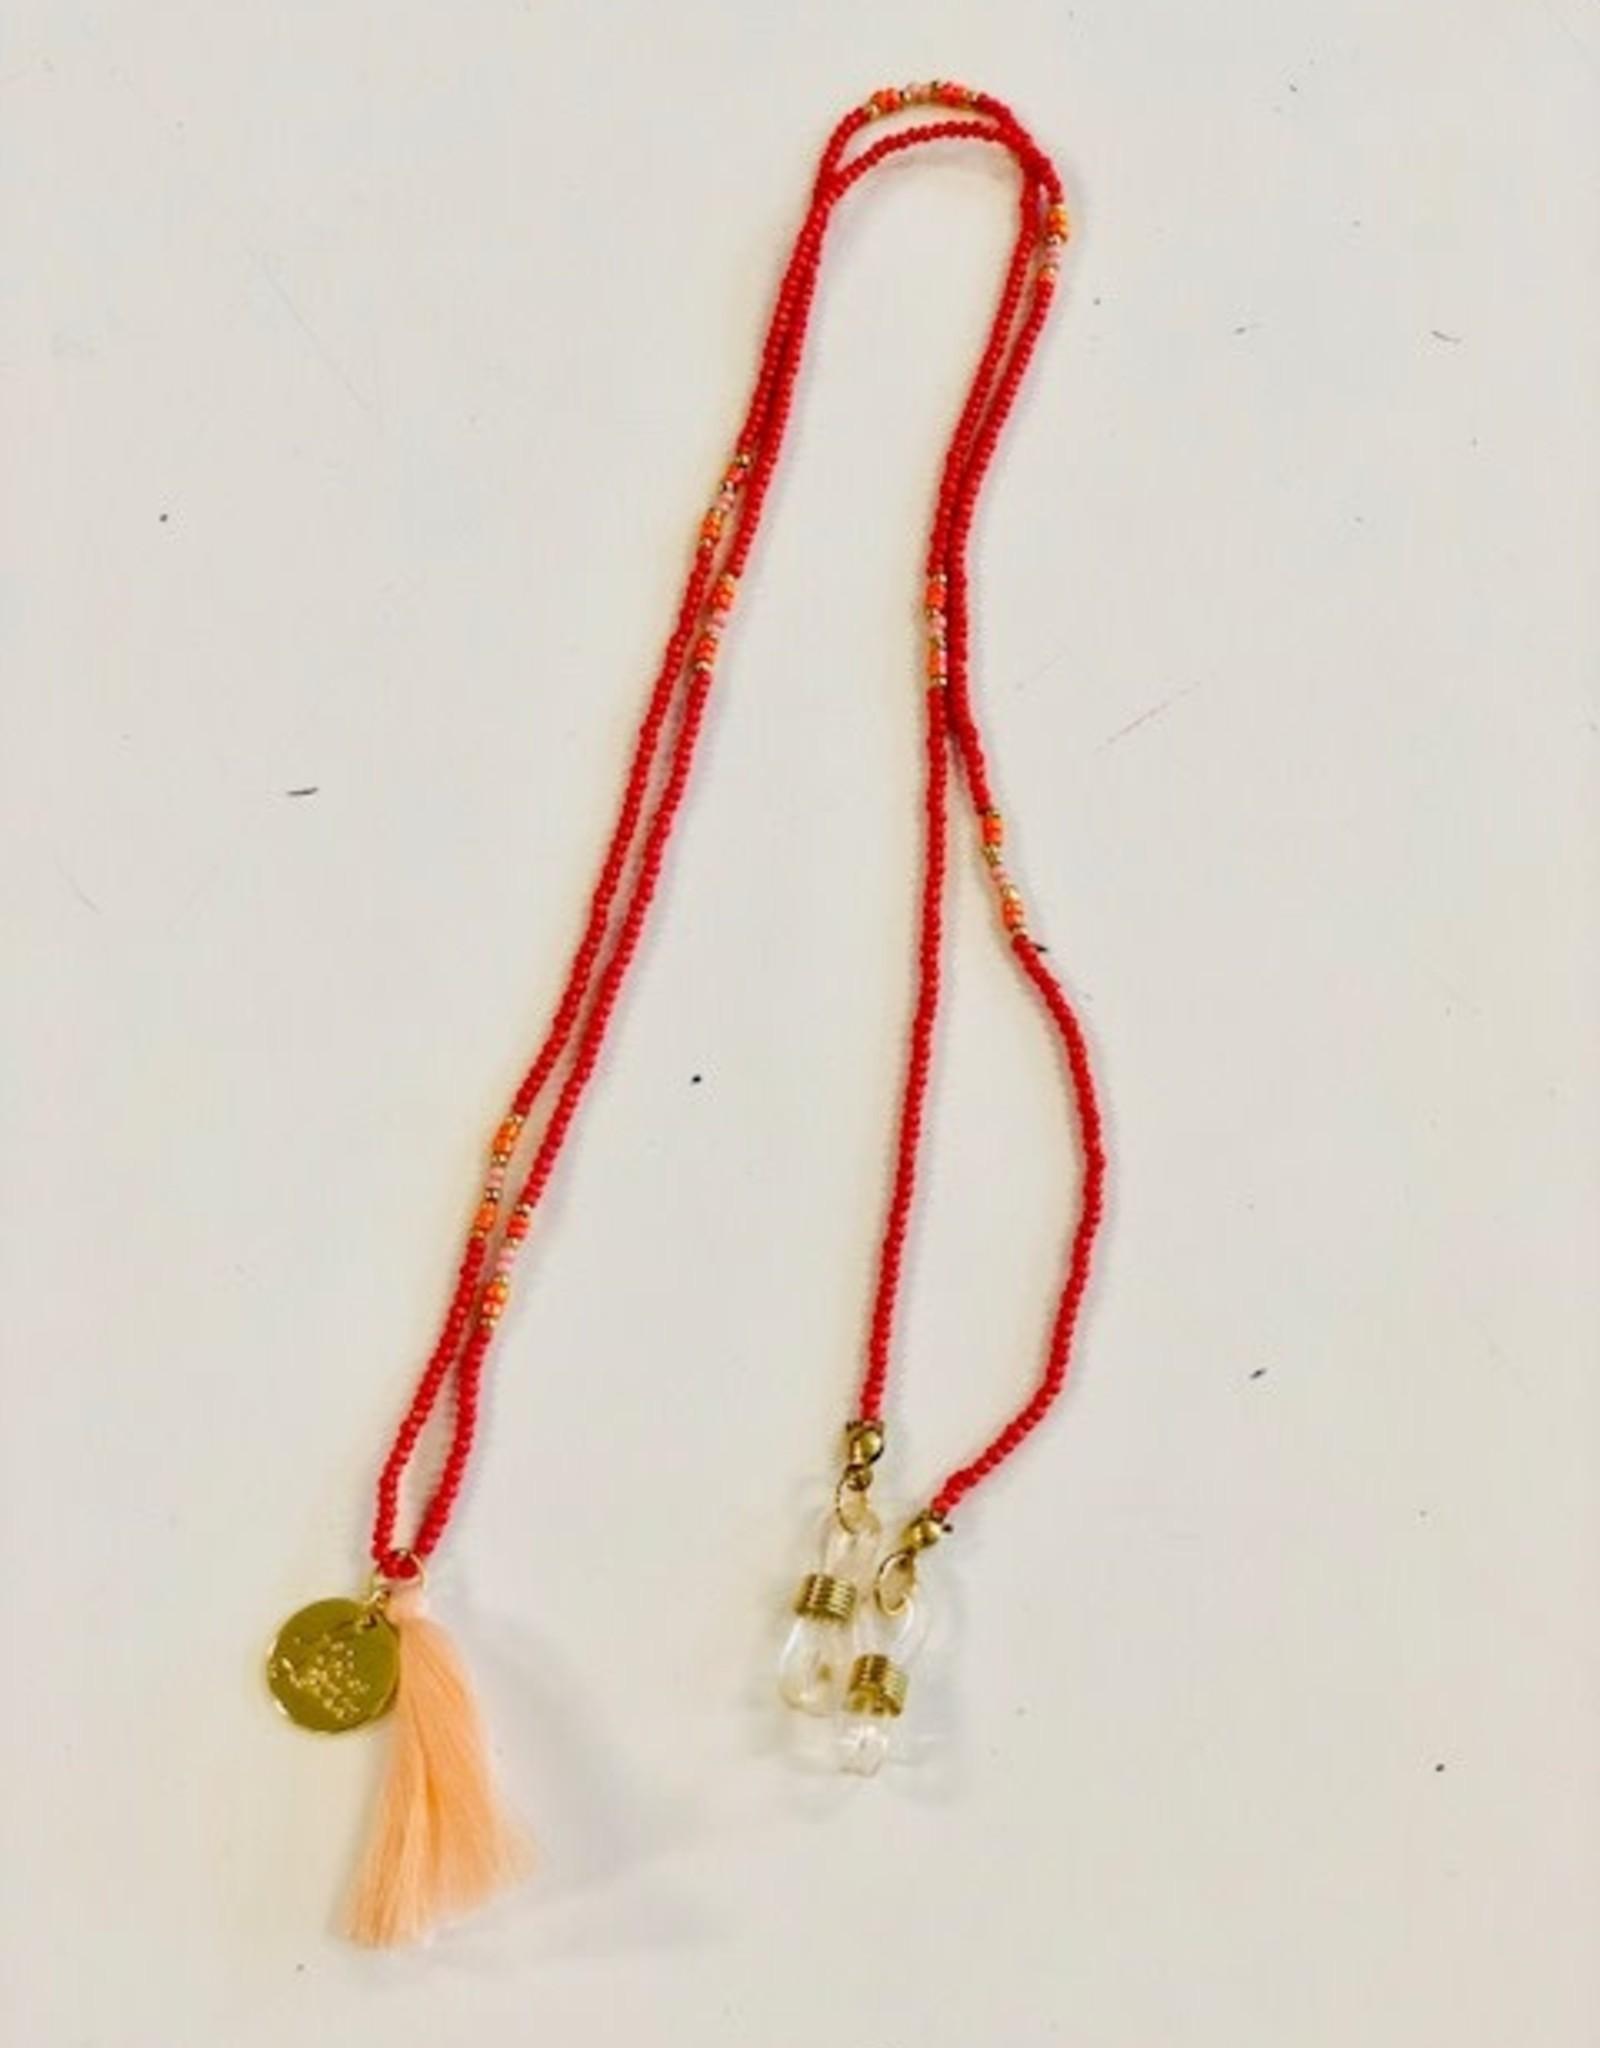 Bulu Bulu Happy Beads Suncords coral